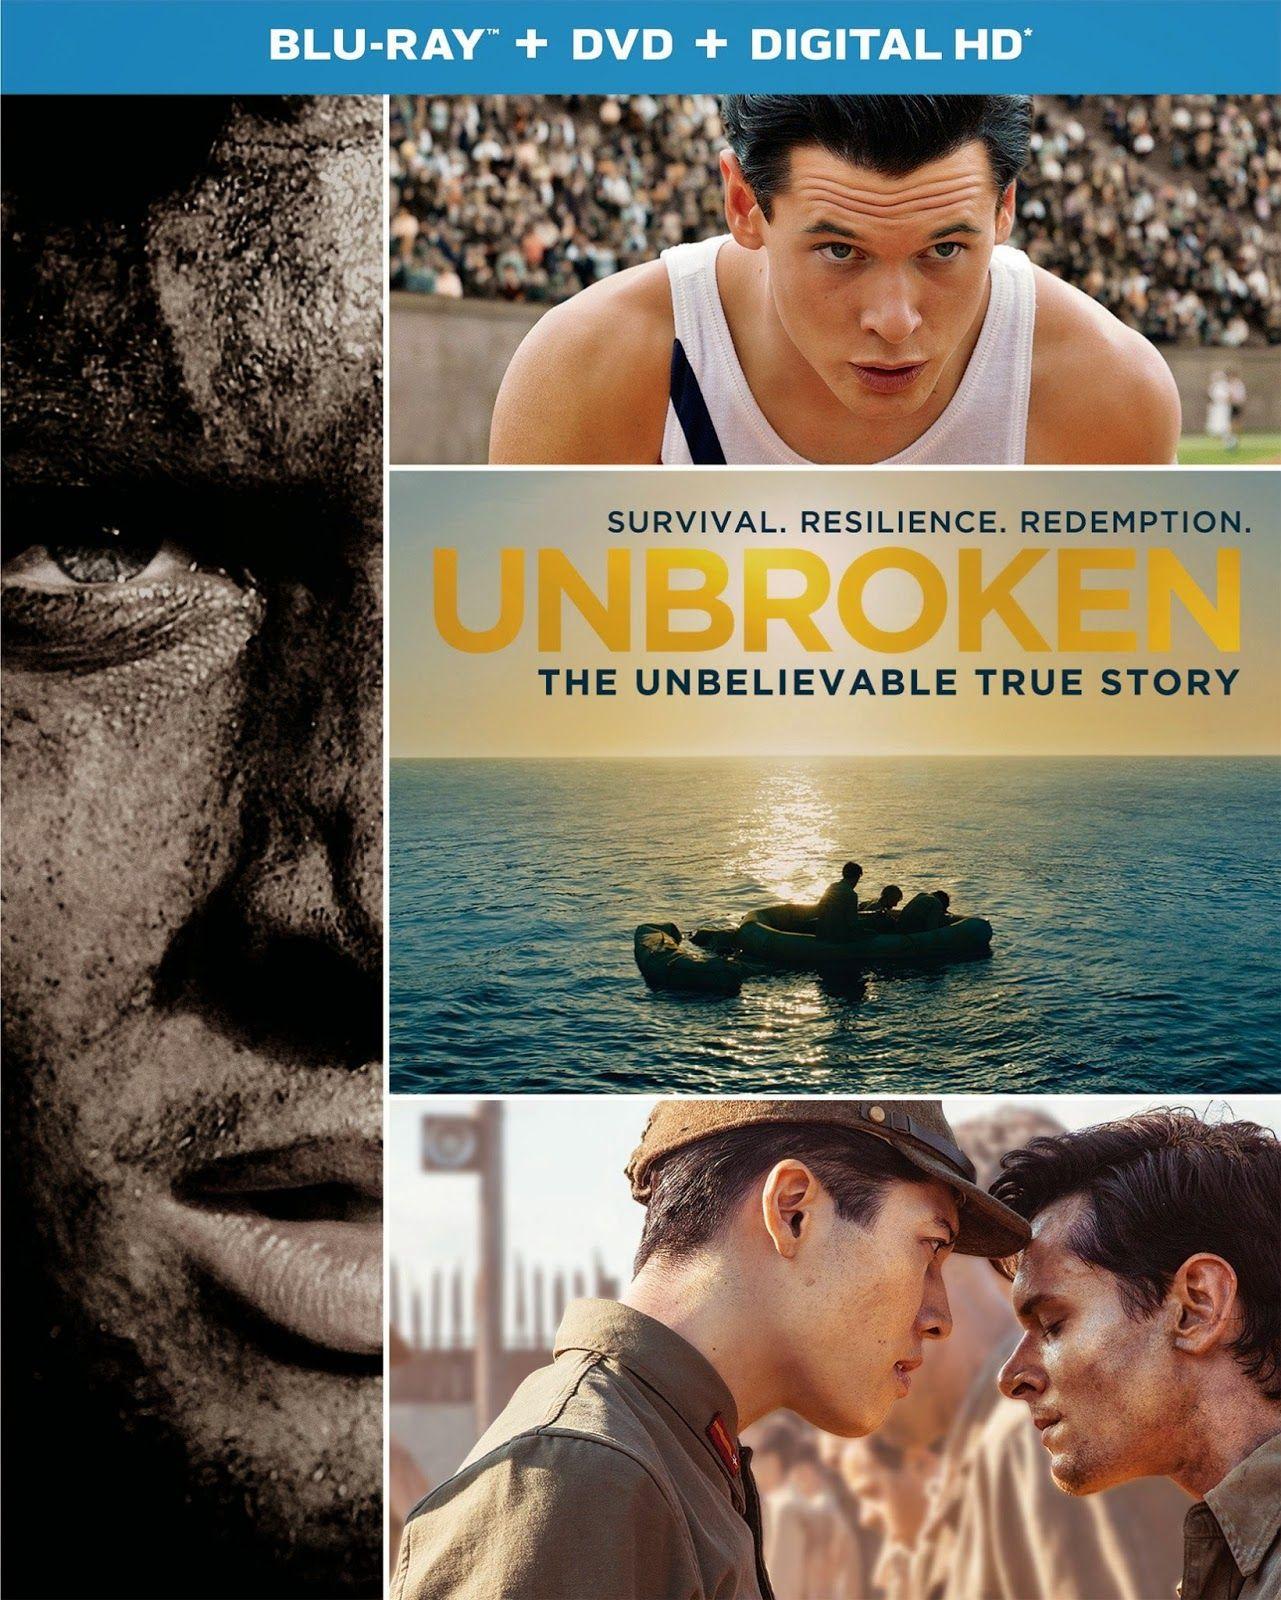 Unbroken (2014) 720p BluRay 1 2GB | Download Movies - 300mb